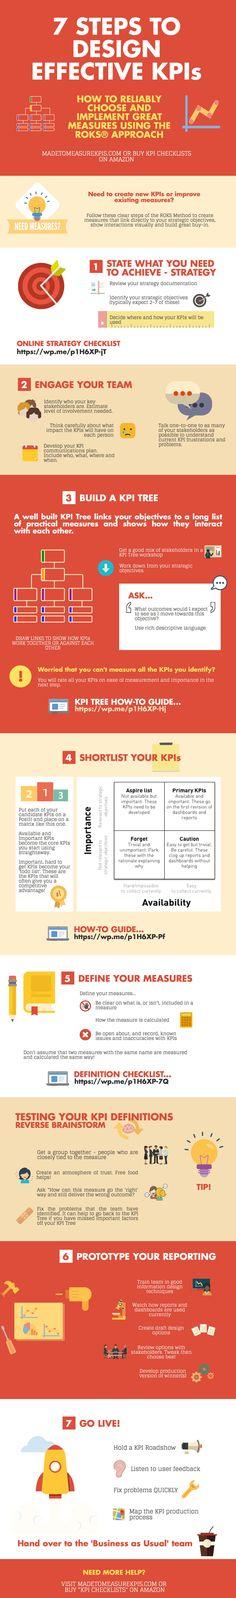 Designing KPIs Infographic